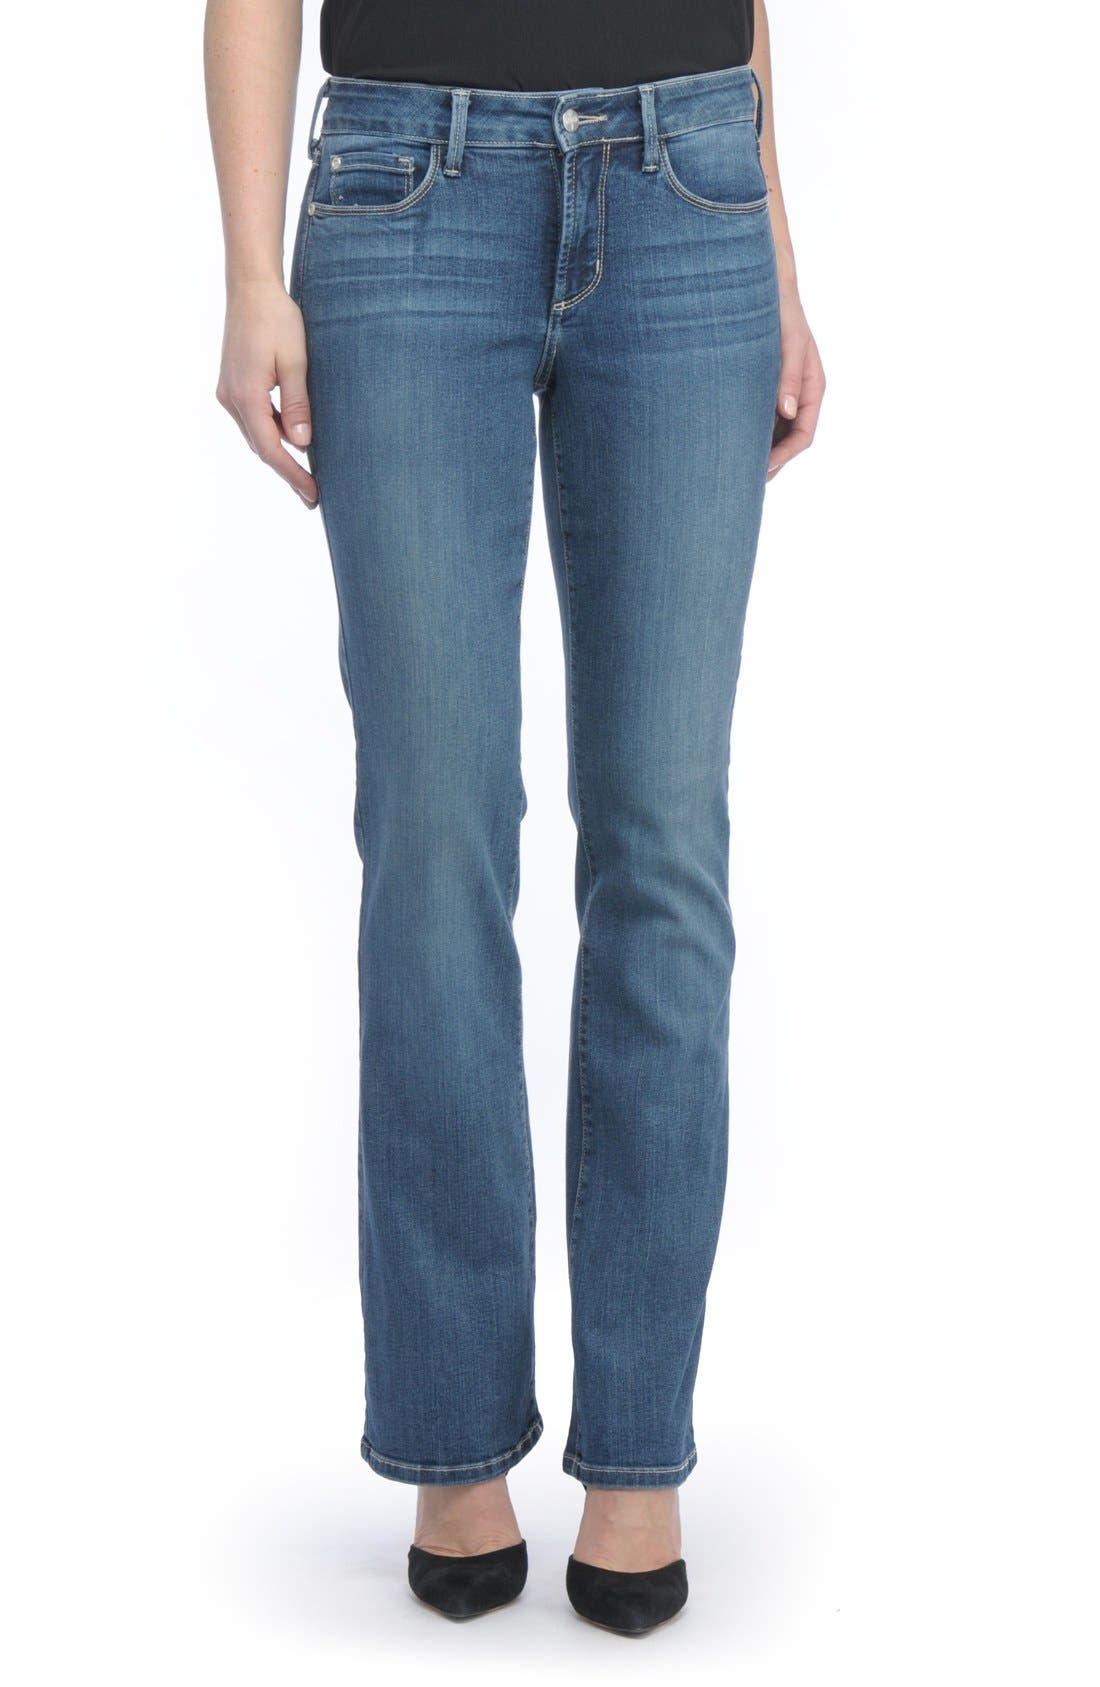 Alternate Image 1 Selected - NYDJ Barbara Stretch Bootcut Jeans (Heyburn) (Regular & Petite)